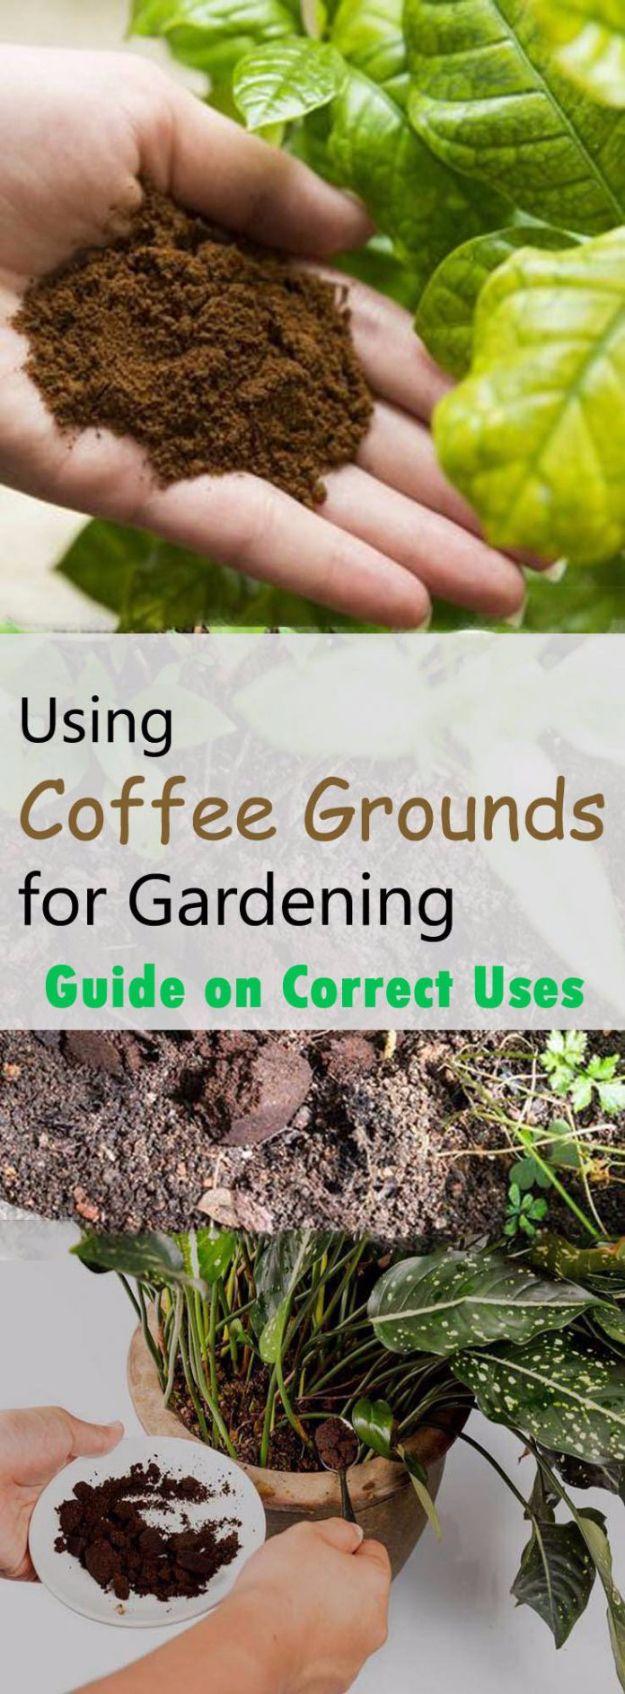 29 DIY Landscaping and Yard Hacks